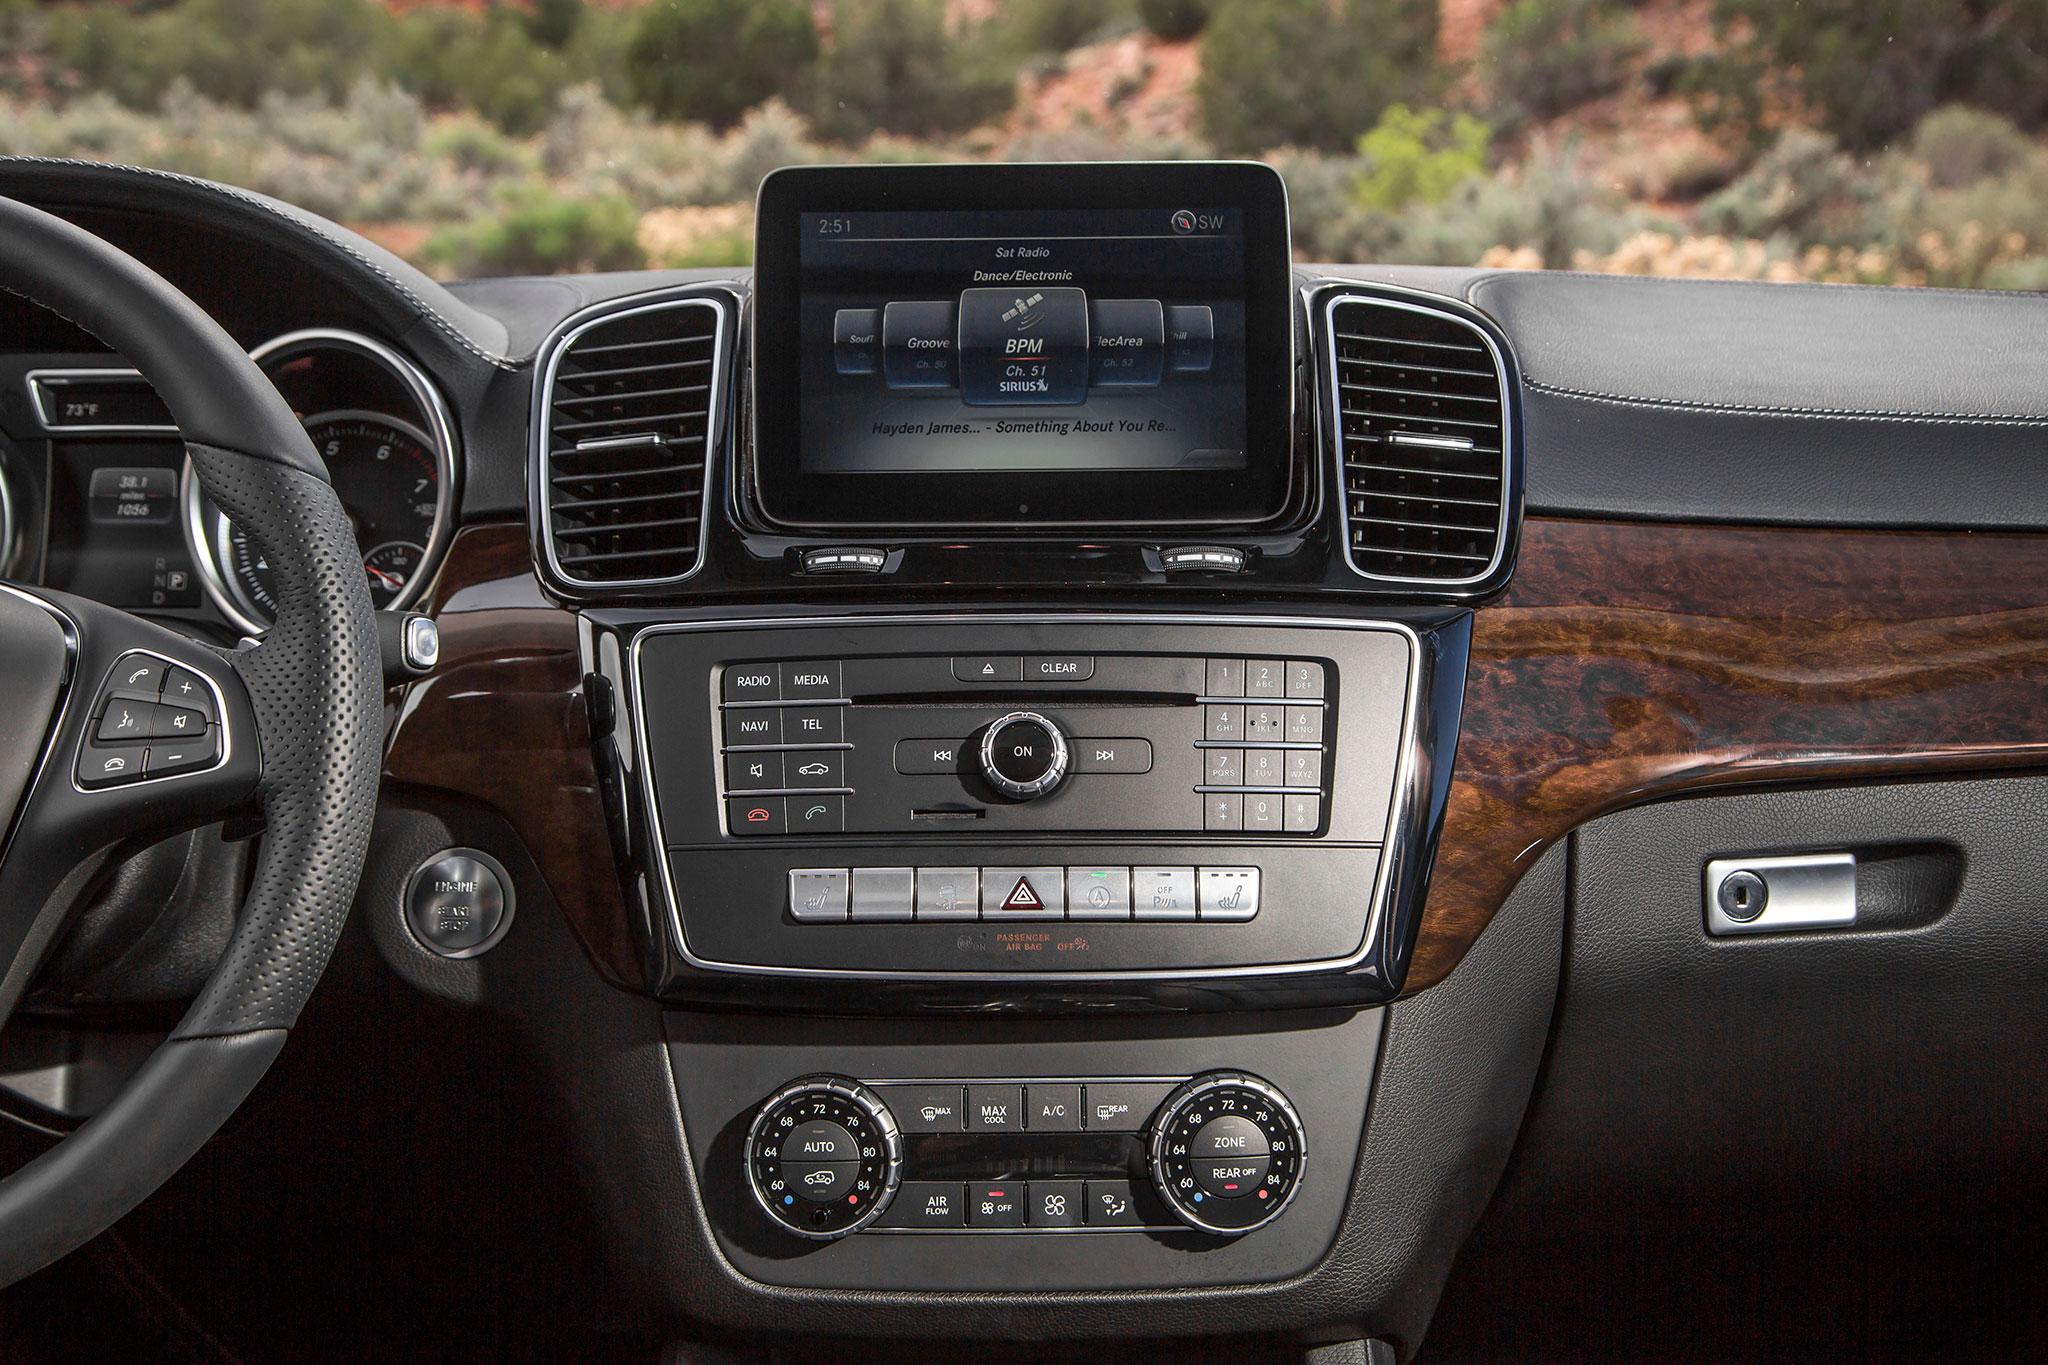 2017 mercedes benz gls class review for Mercedes benz gls 450 review